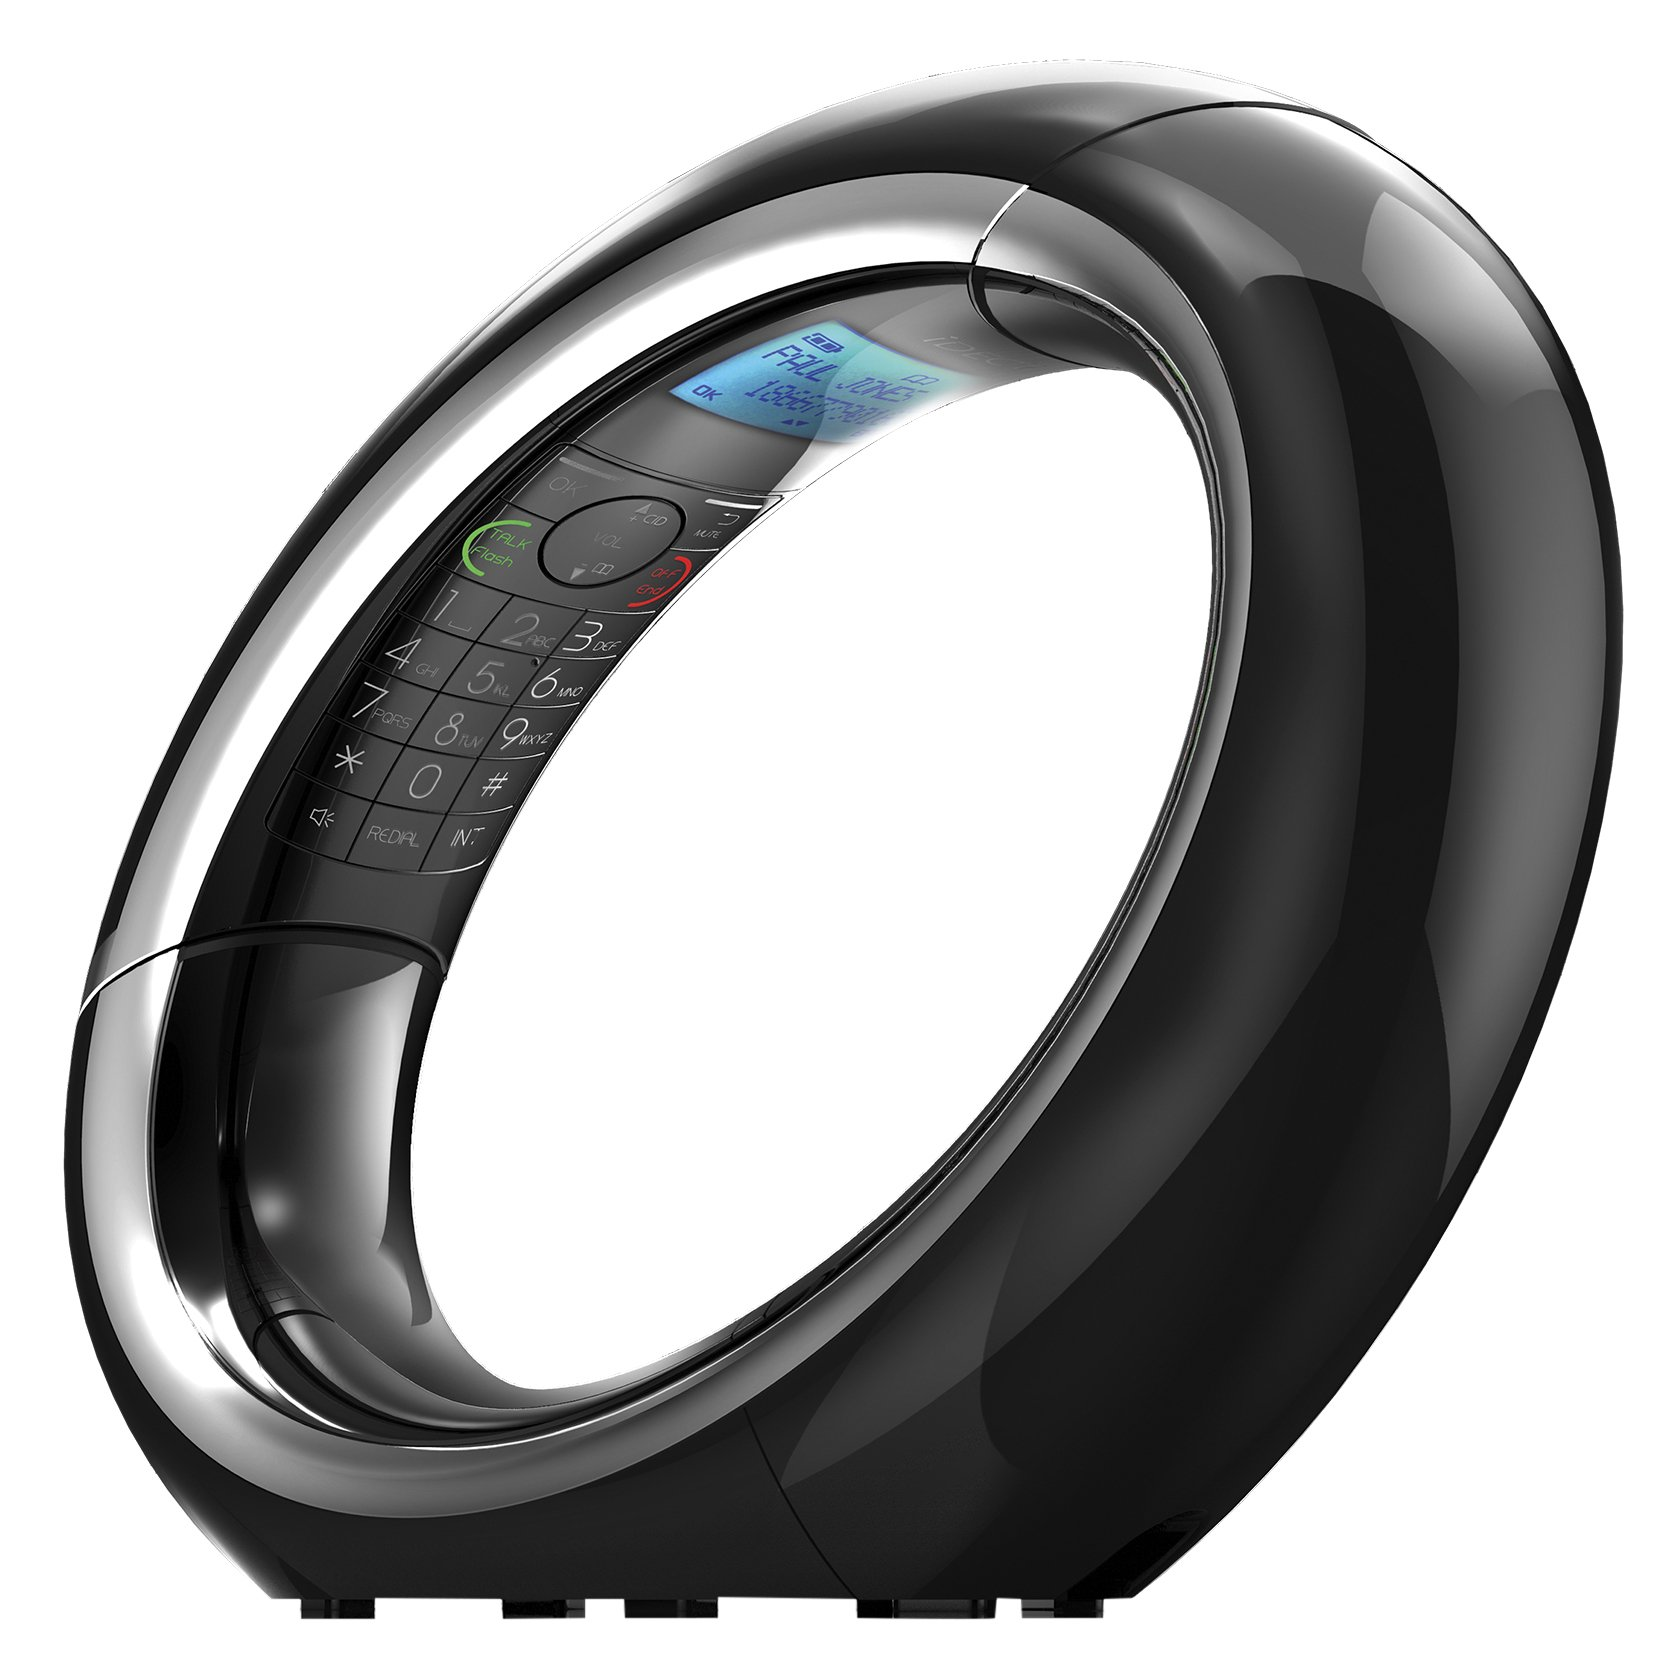 Eclipse Digital Cordless Answering Machine